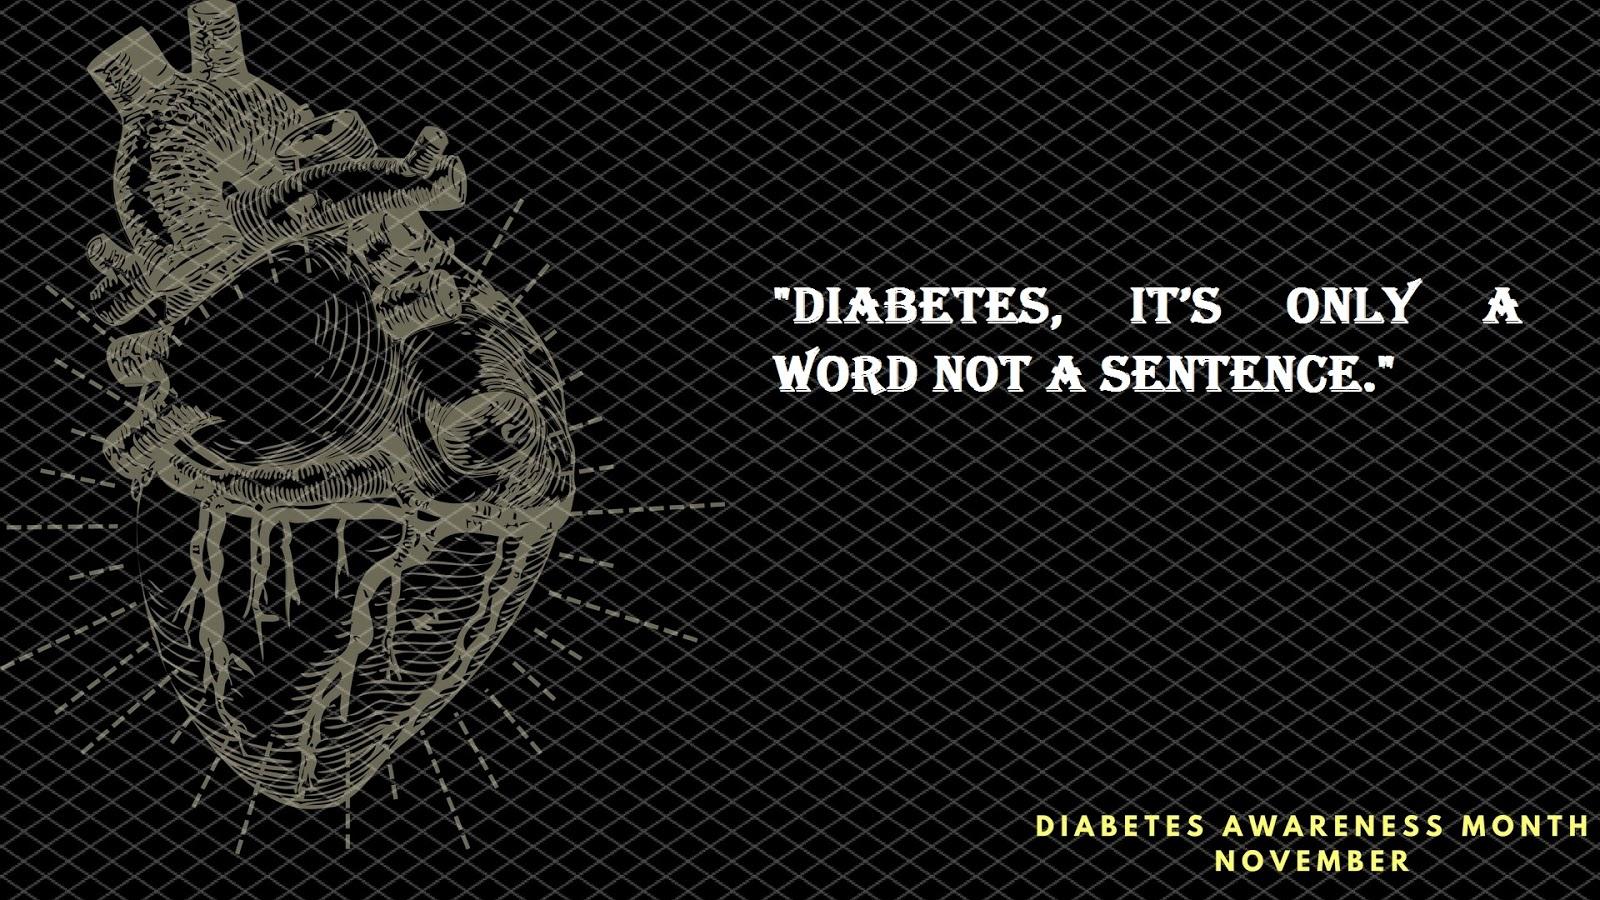 diabetes day quotes